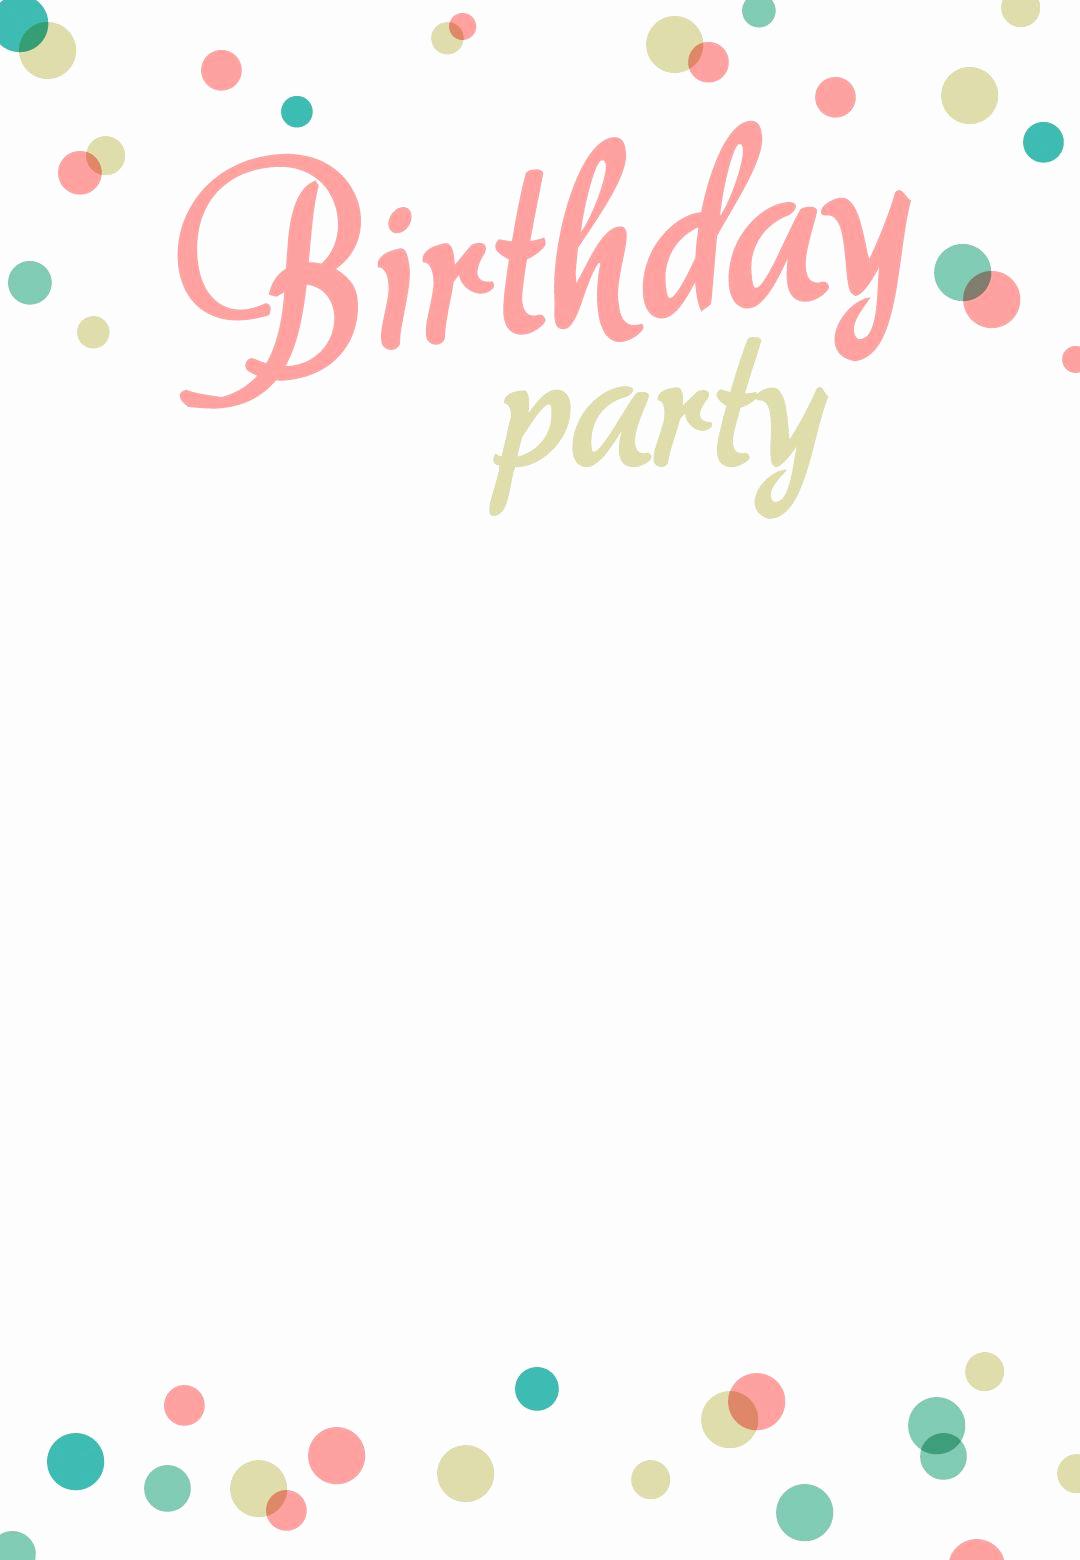 Free Birthday Party Invitation Template Beautiful Birthday Party Invitation Free Printable